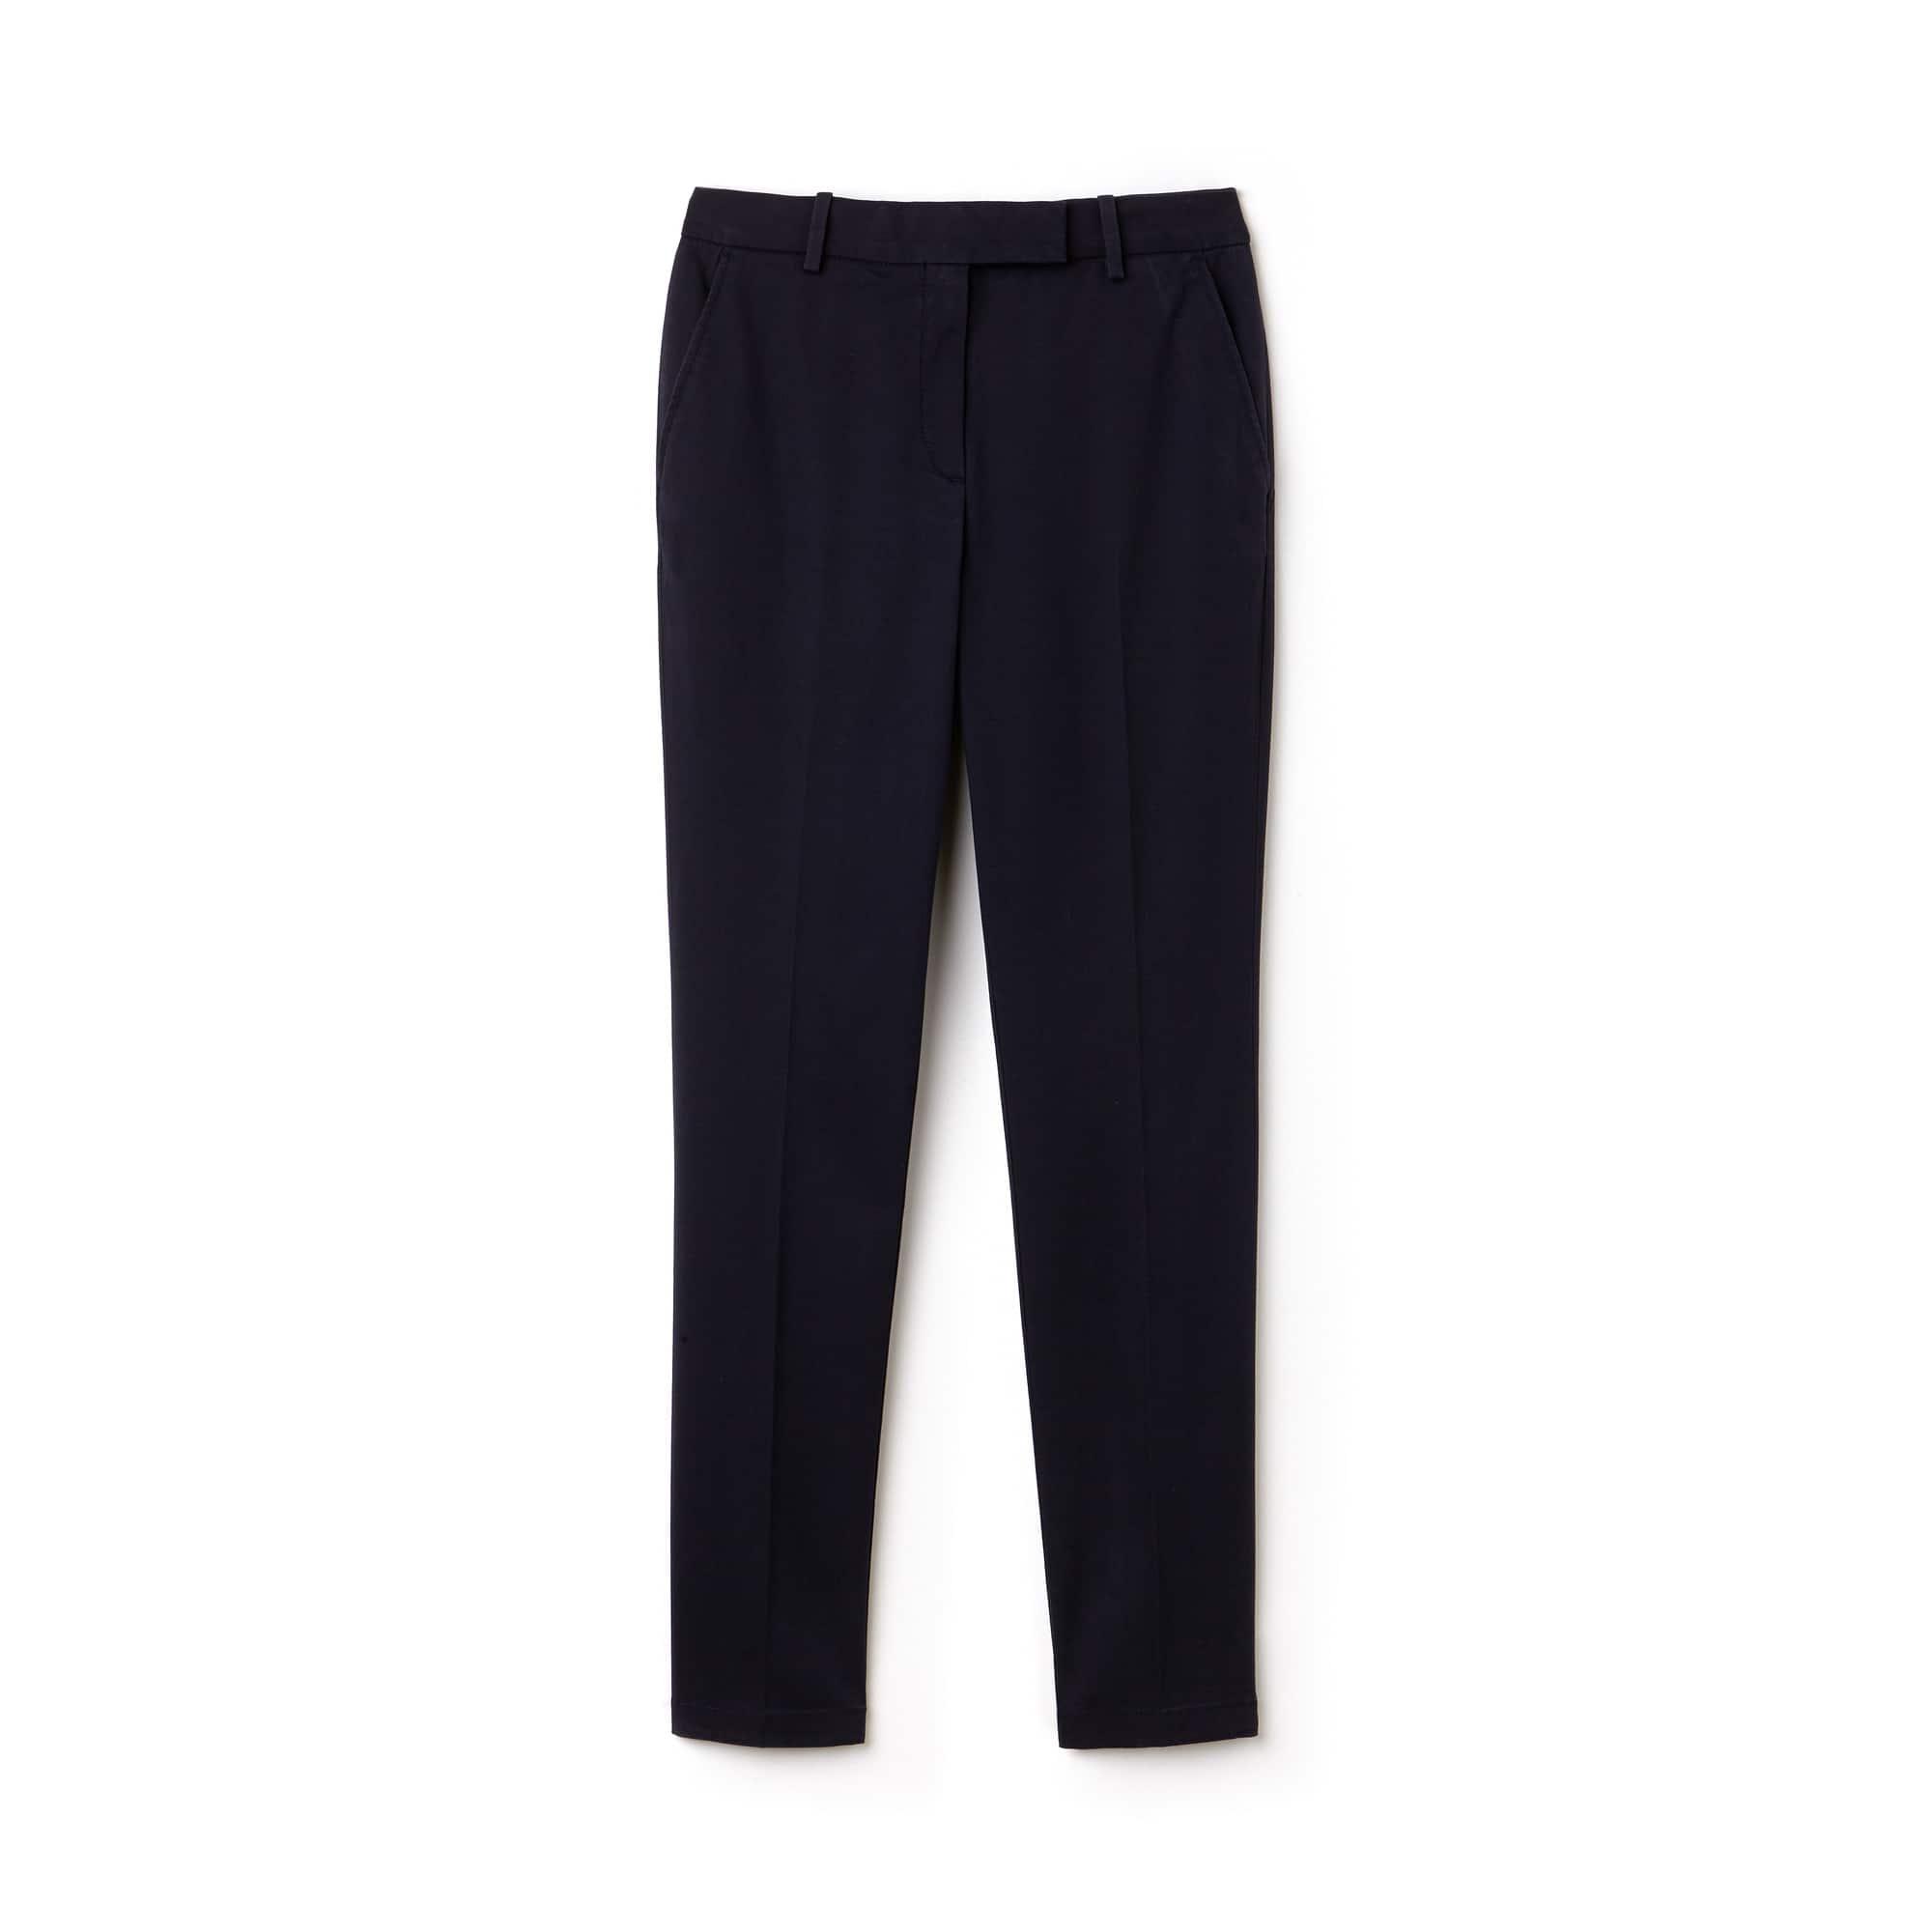 Women's Regular Fit Stretch Cotton Gabardine Chino Pants